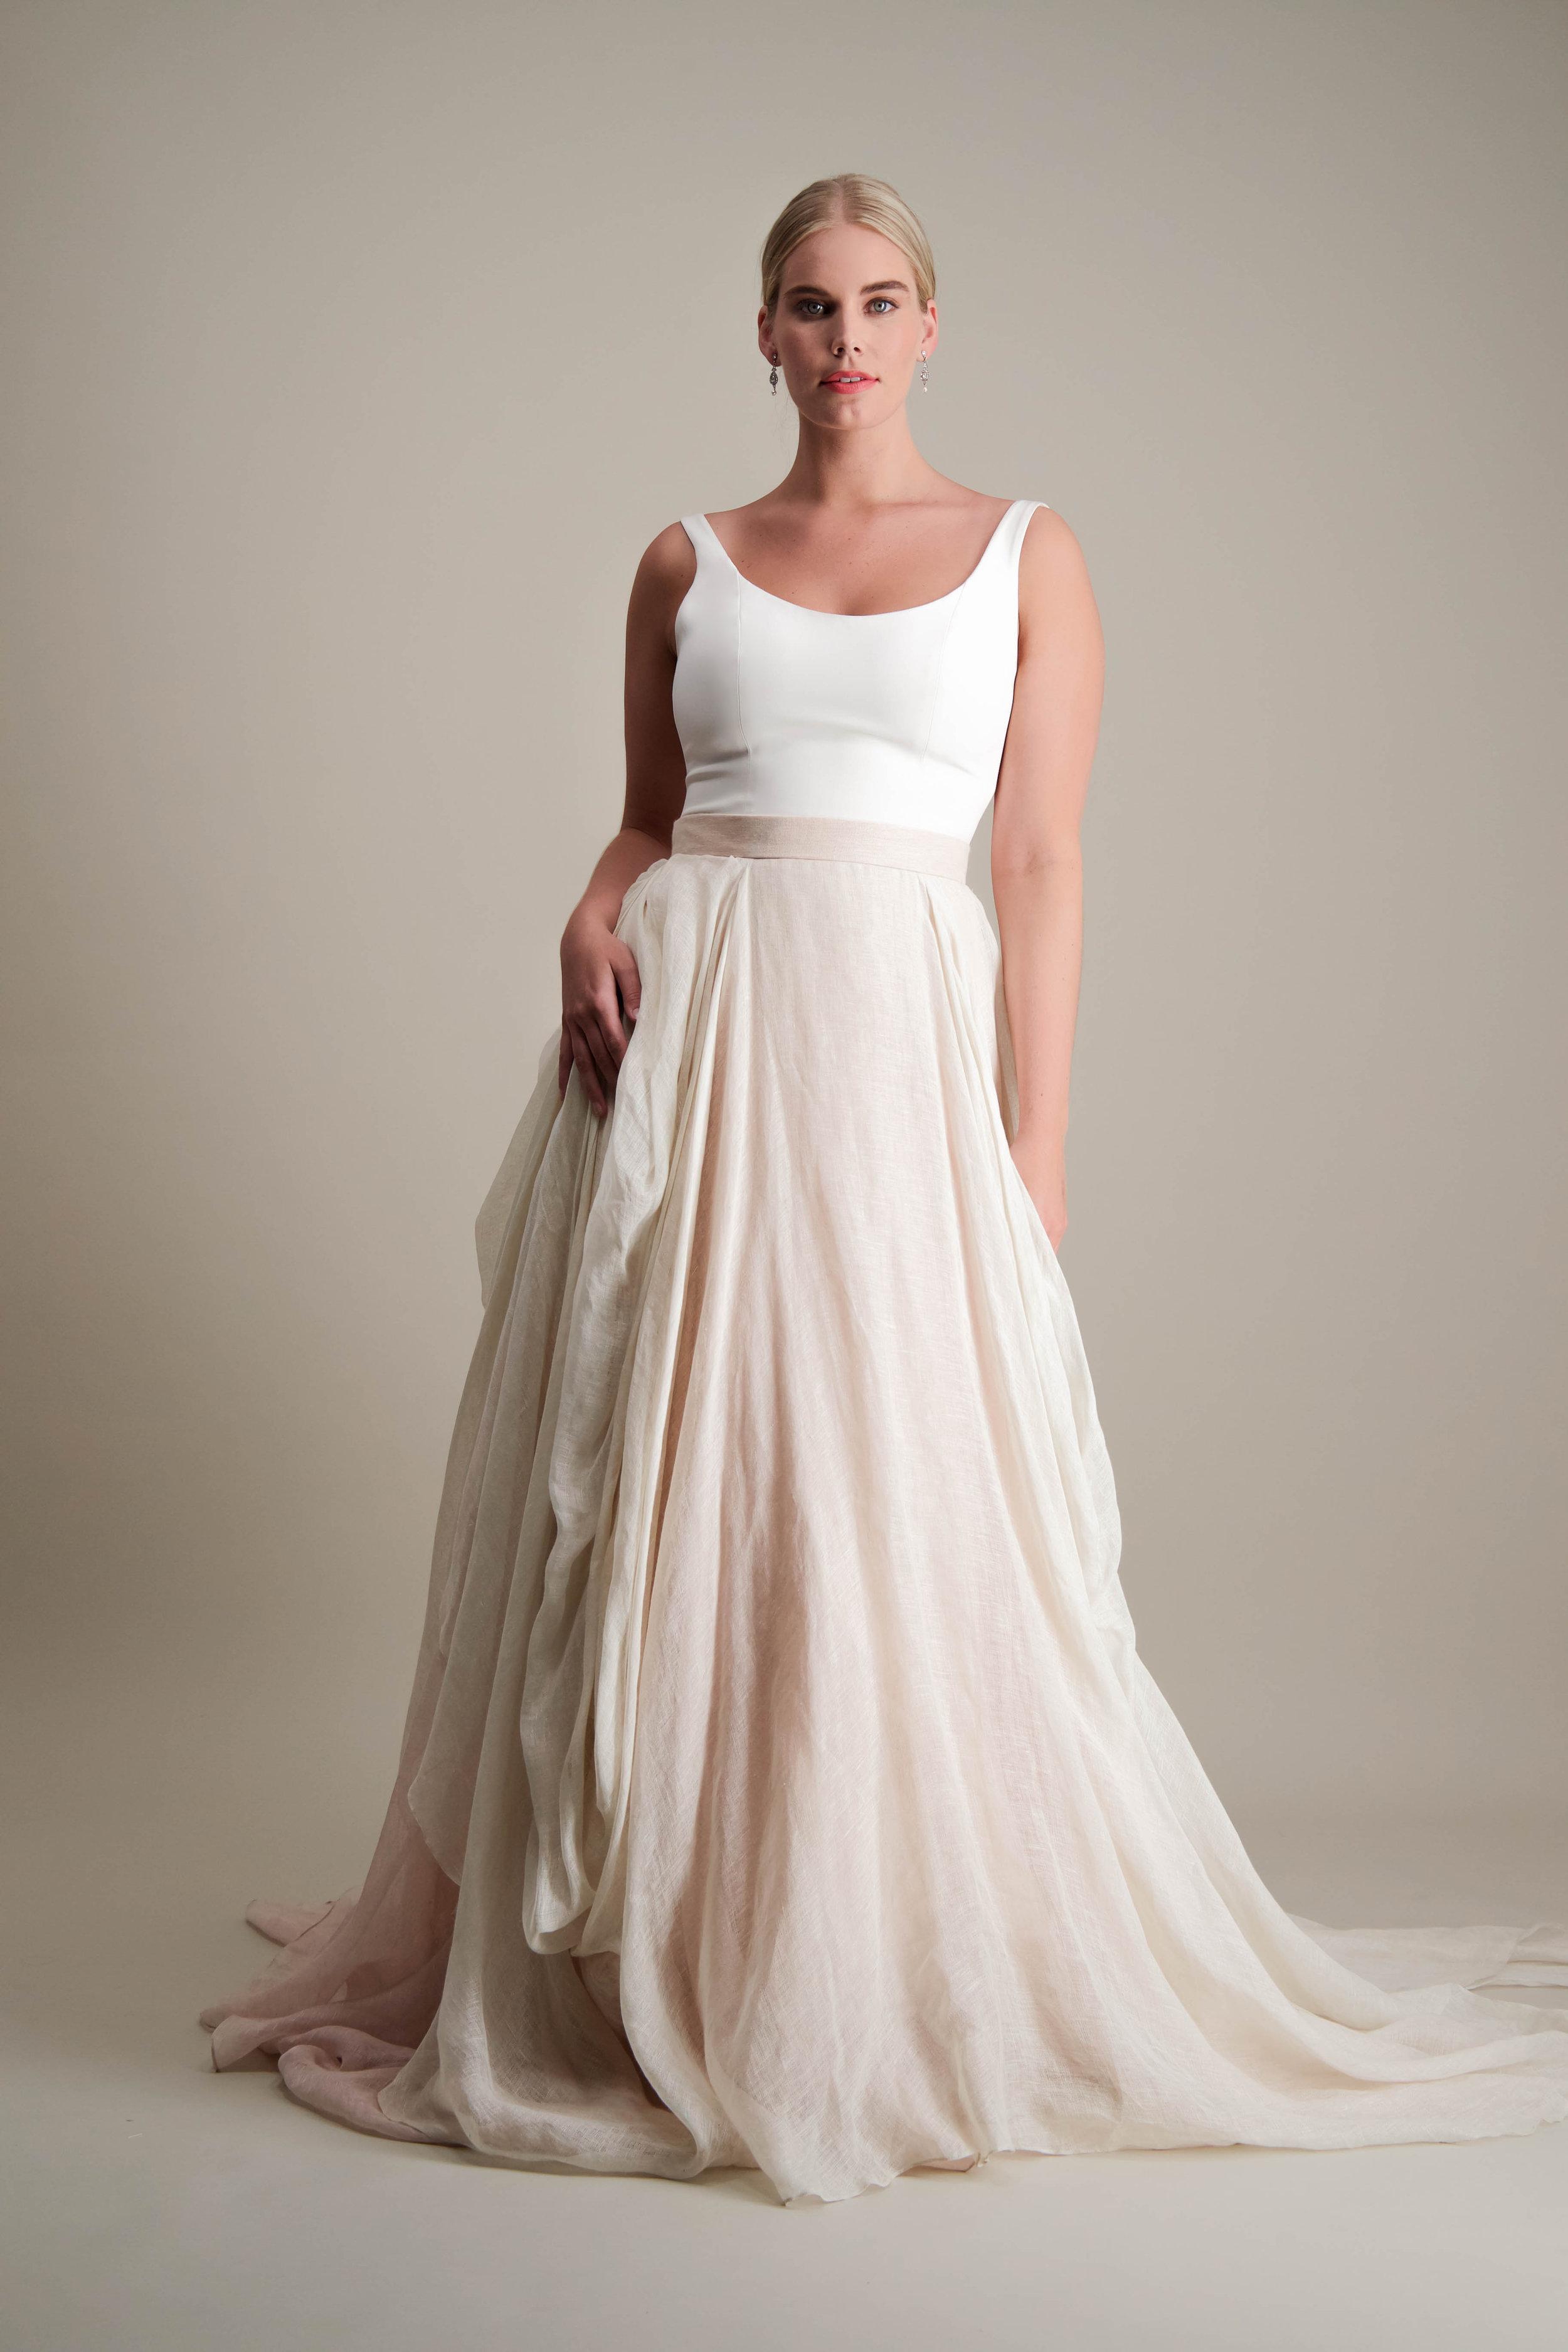 Kensington Skirt draped linen ball gown with scoop neck tank bodice 1.jpg